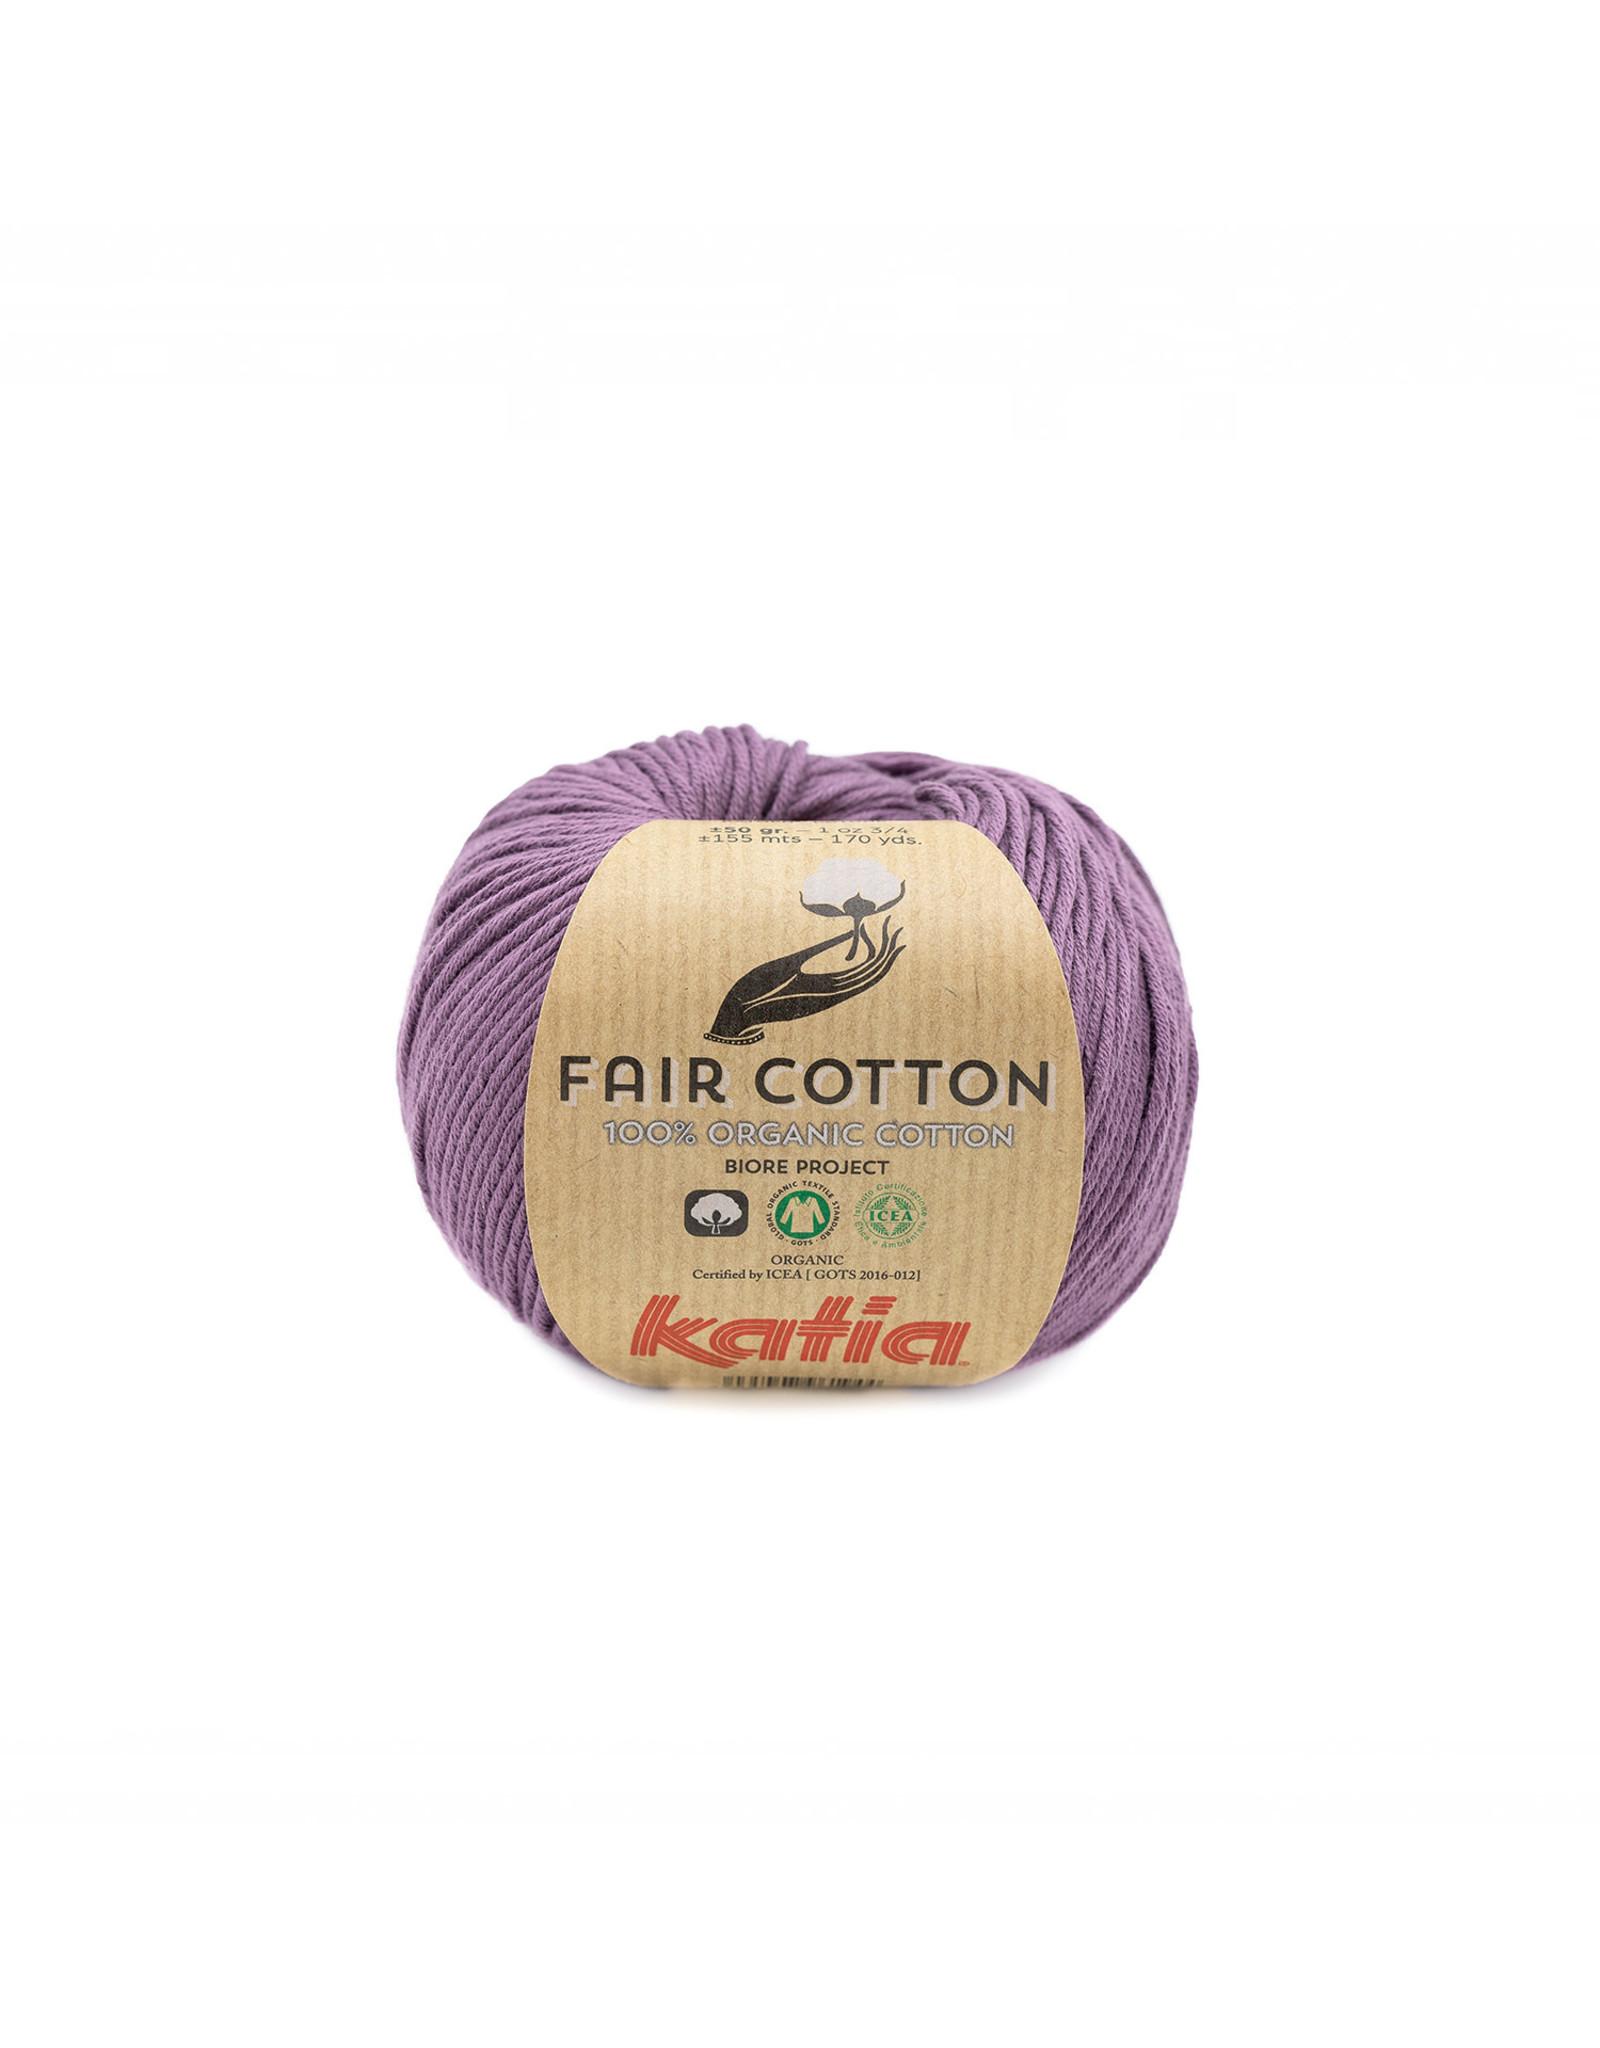 Katia Katia Fair Cotton 39 - donkerpaars - 50 gr. - 100% biol. katoen